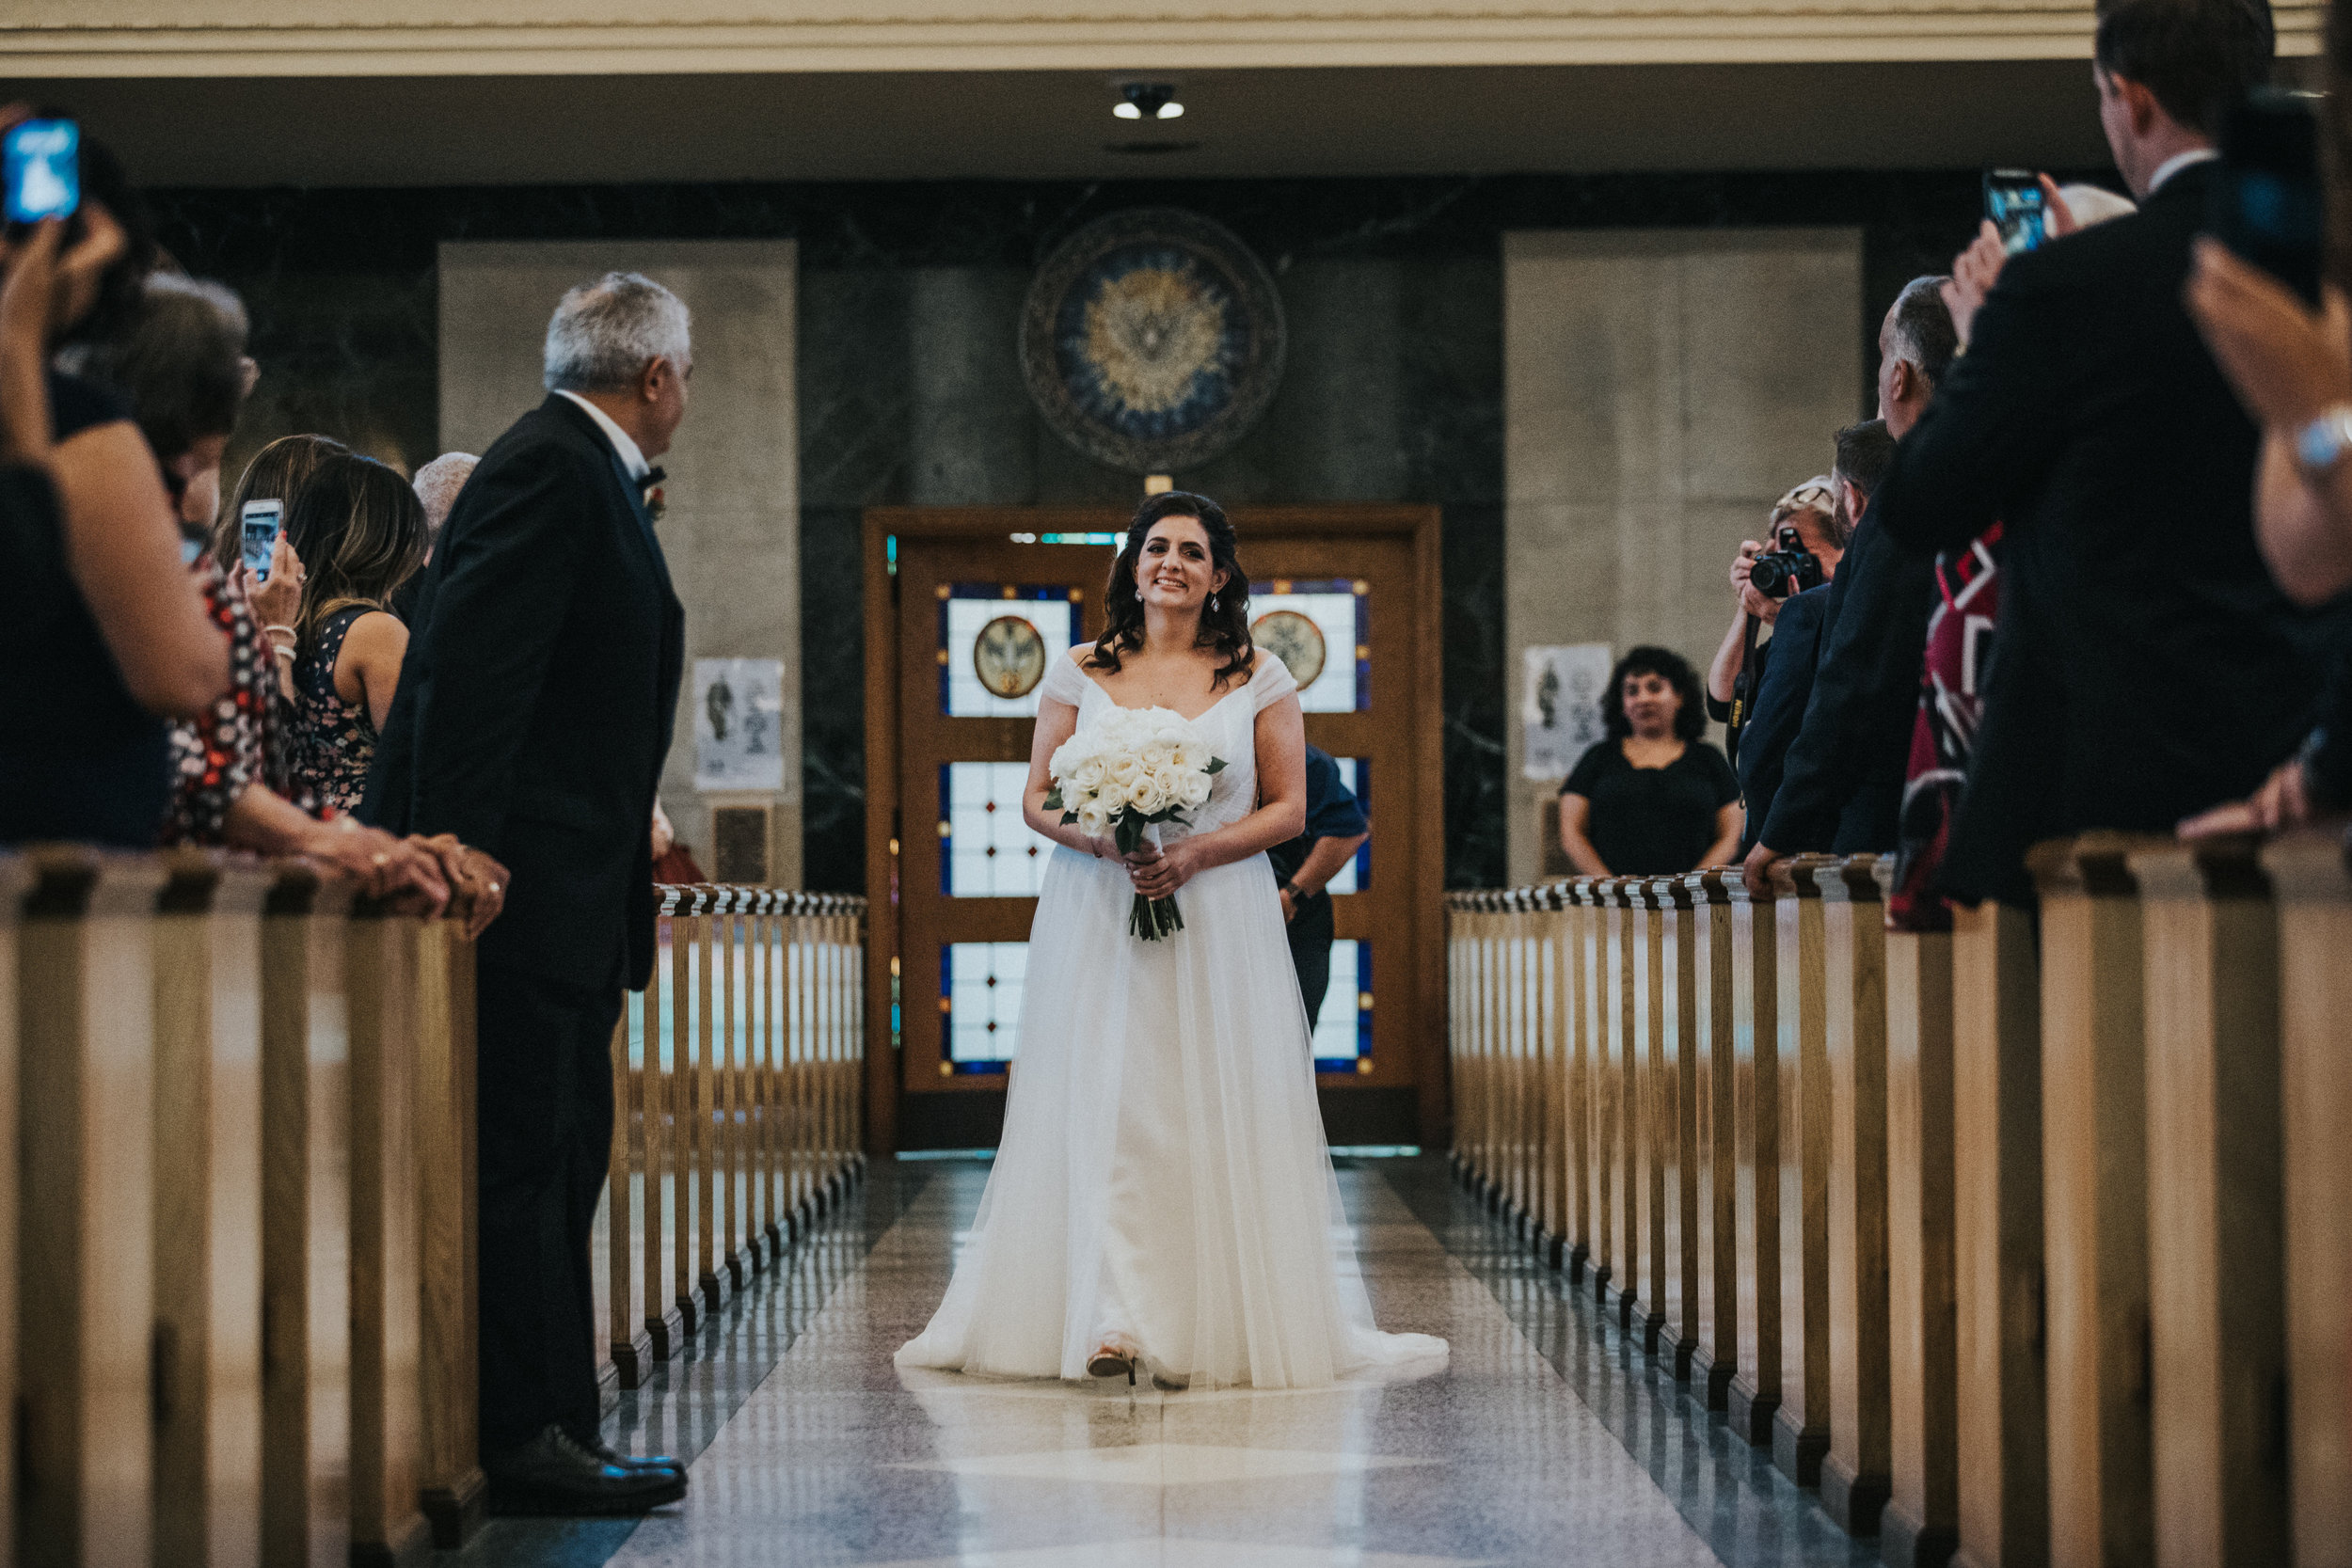 JennaLynnPhotography-NJWeddingPhotographer-Philadelphia-Wedding-ArtsBallroom-Ceremony-20.jpg